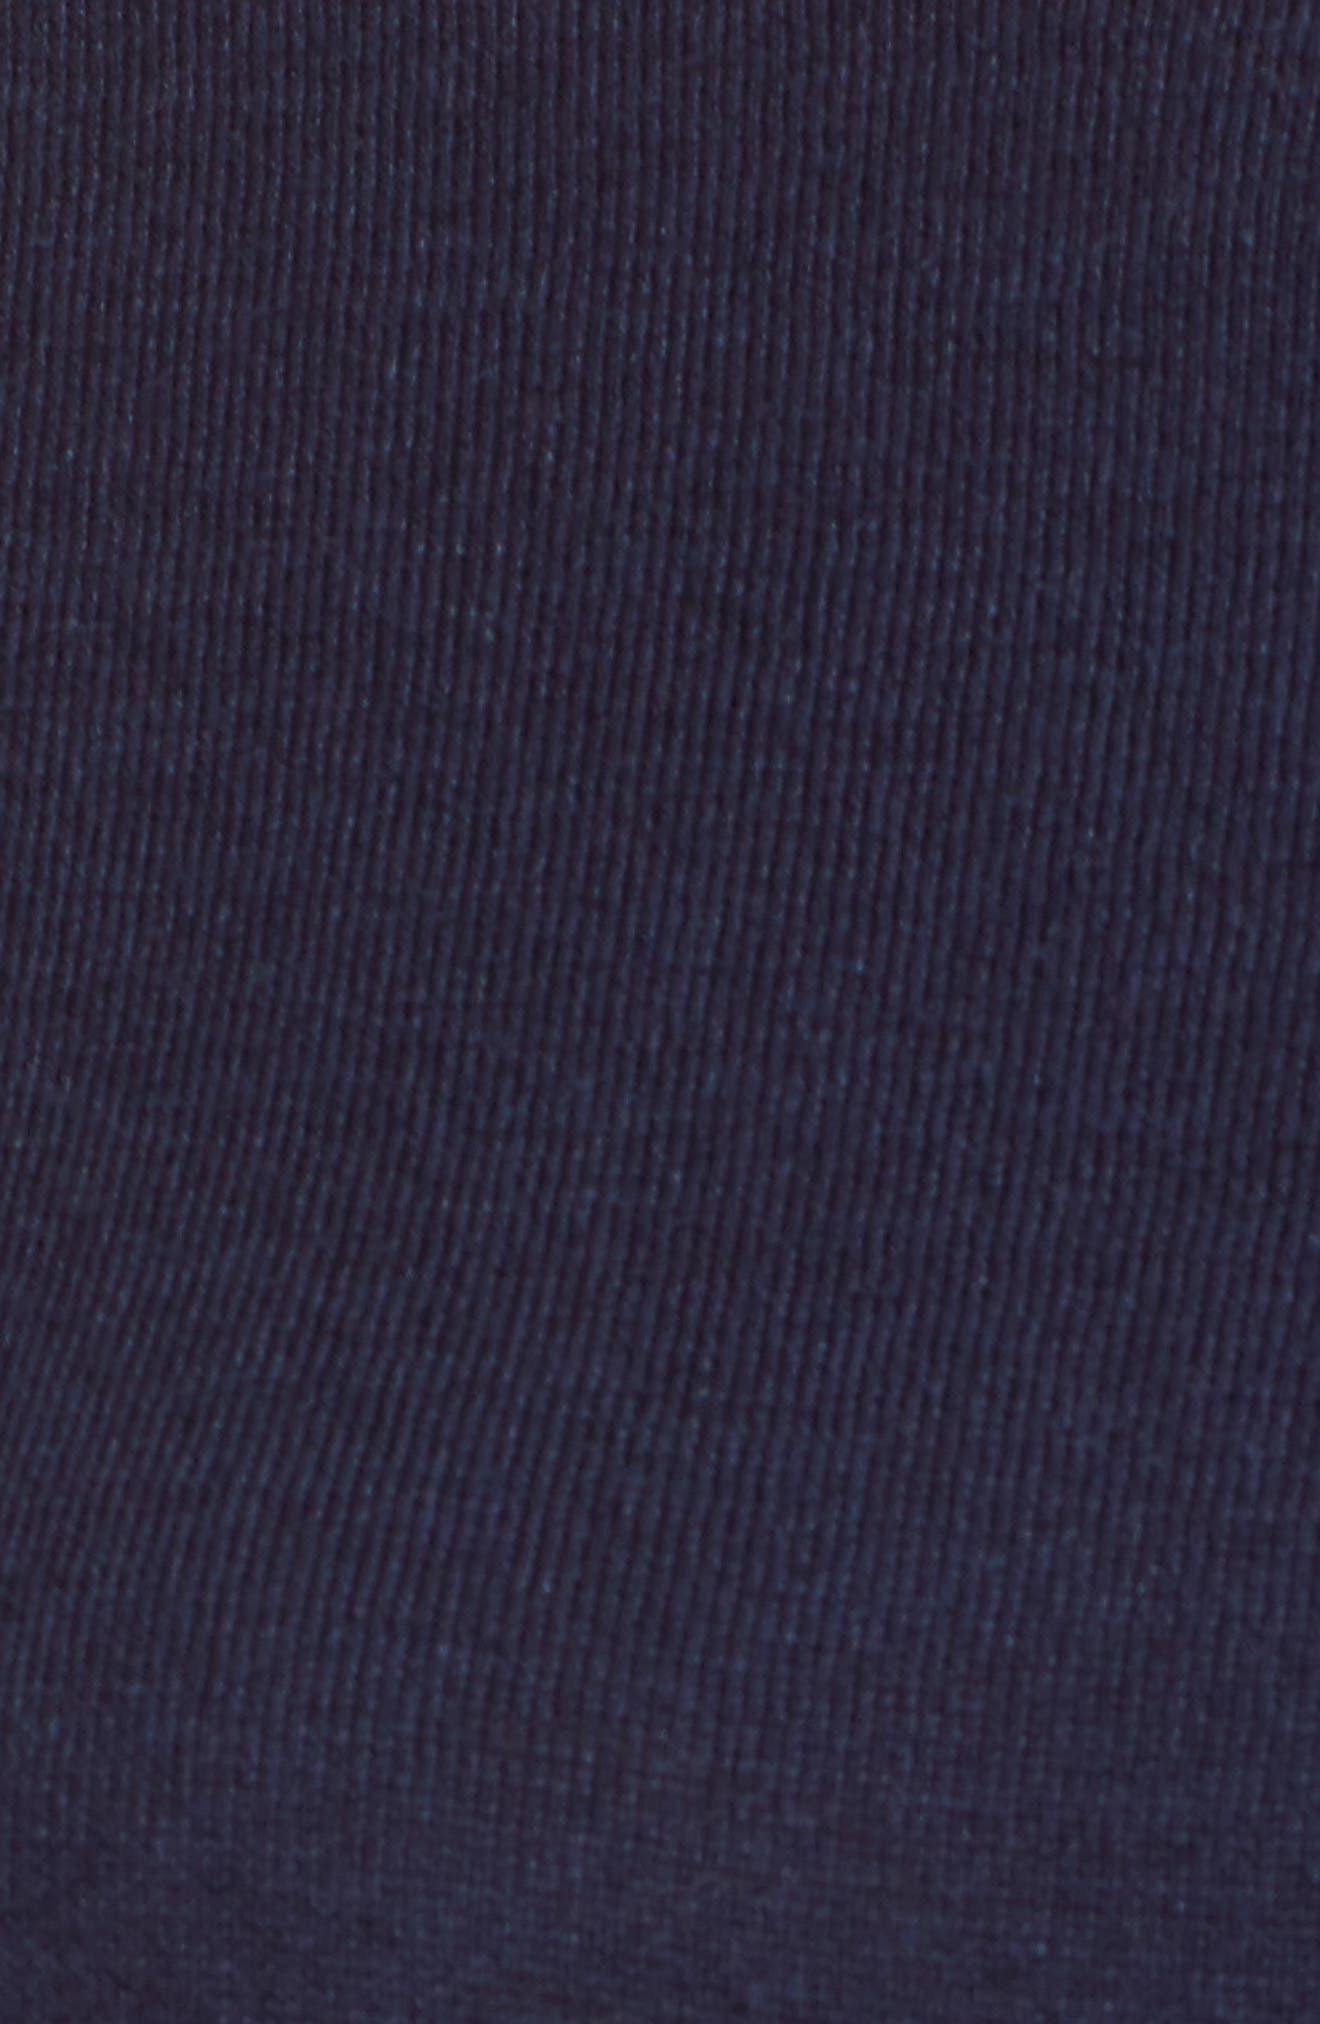 Lightweight Sweater,                             Alternate thumbnail 23, color,